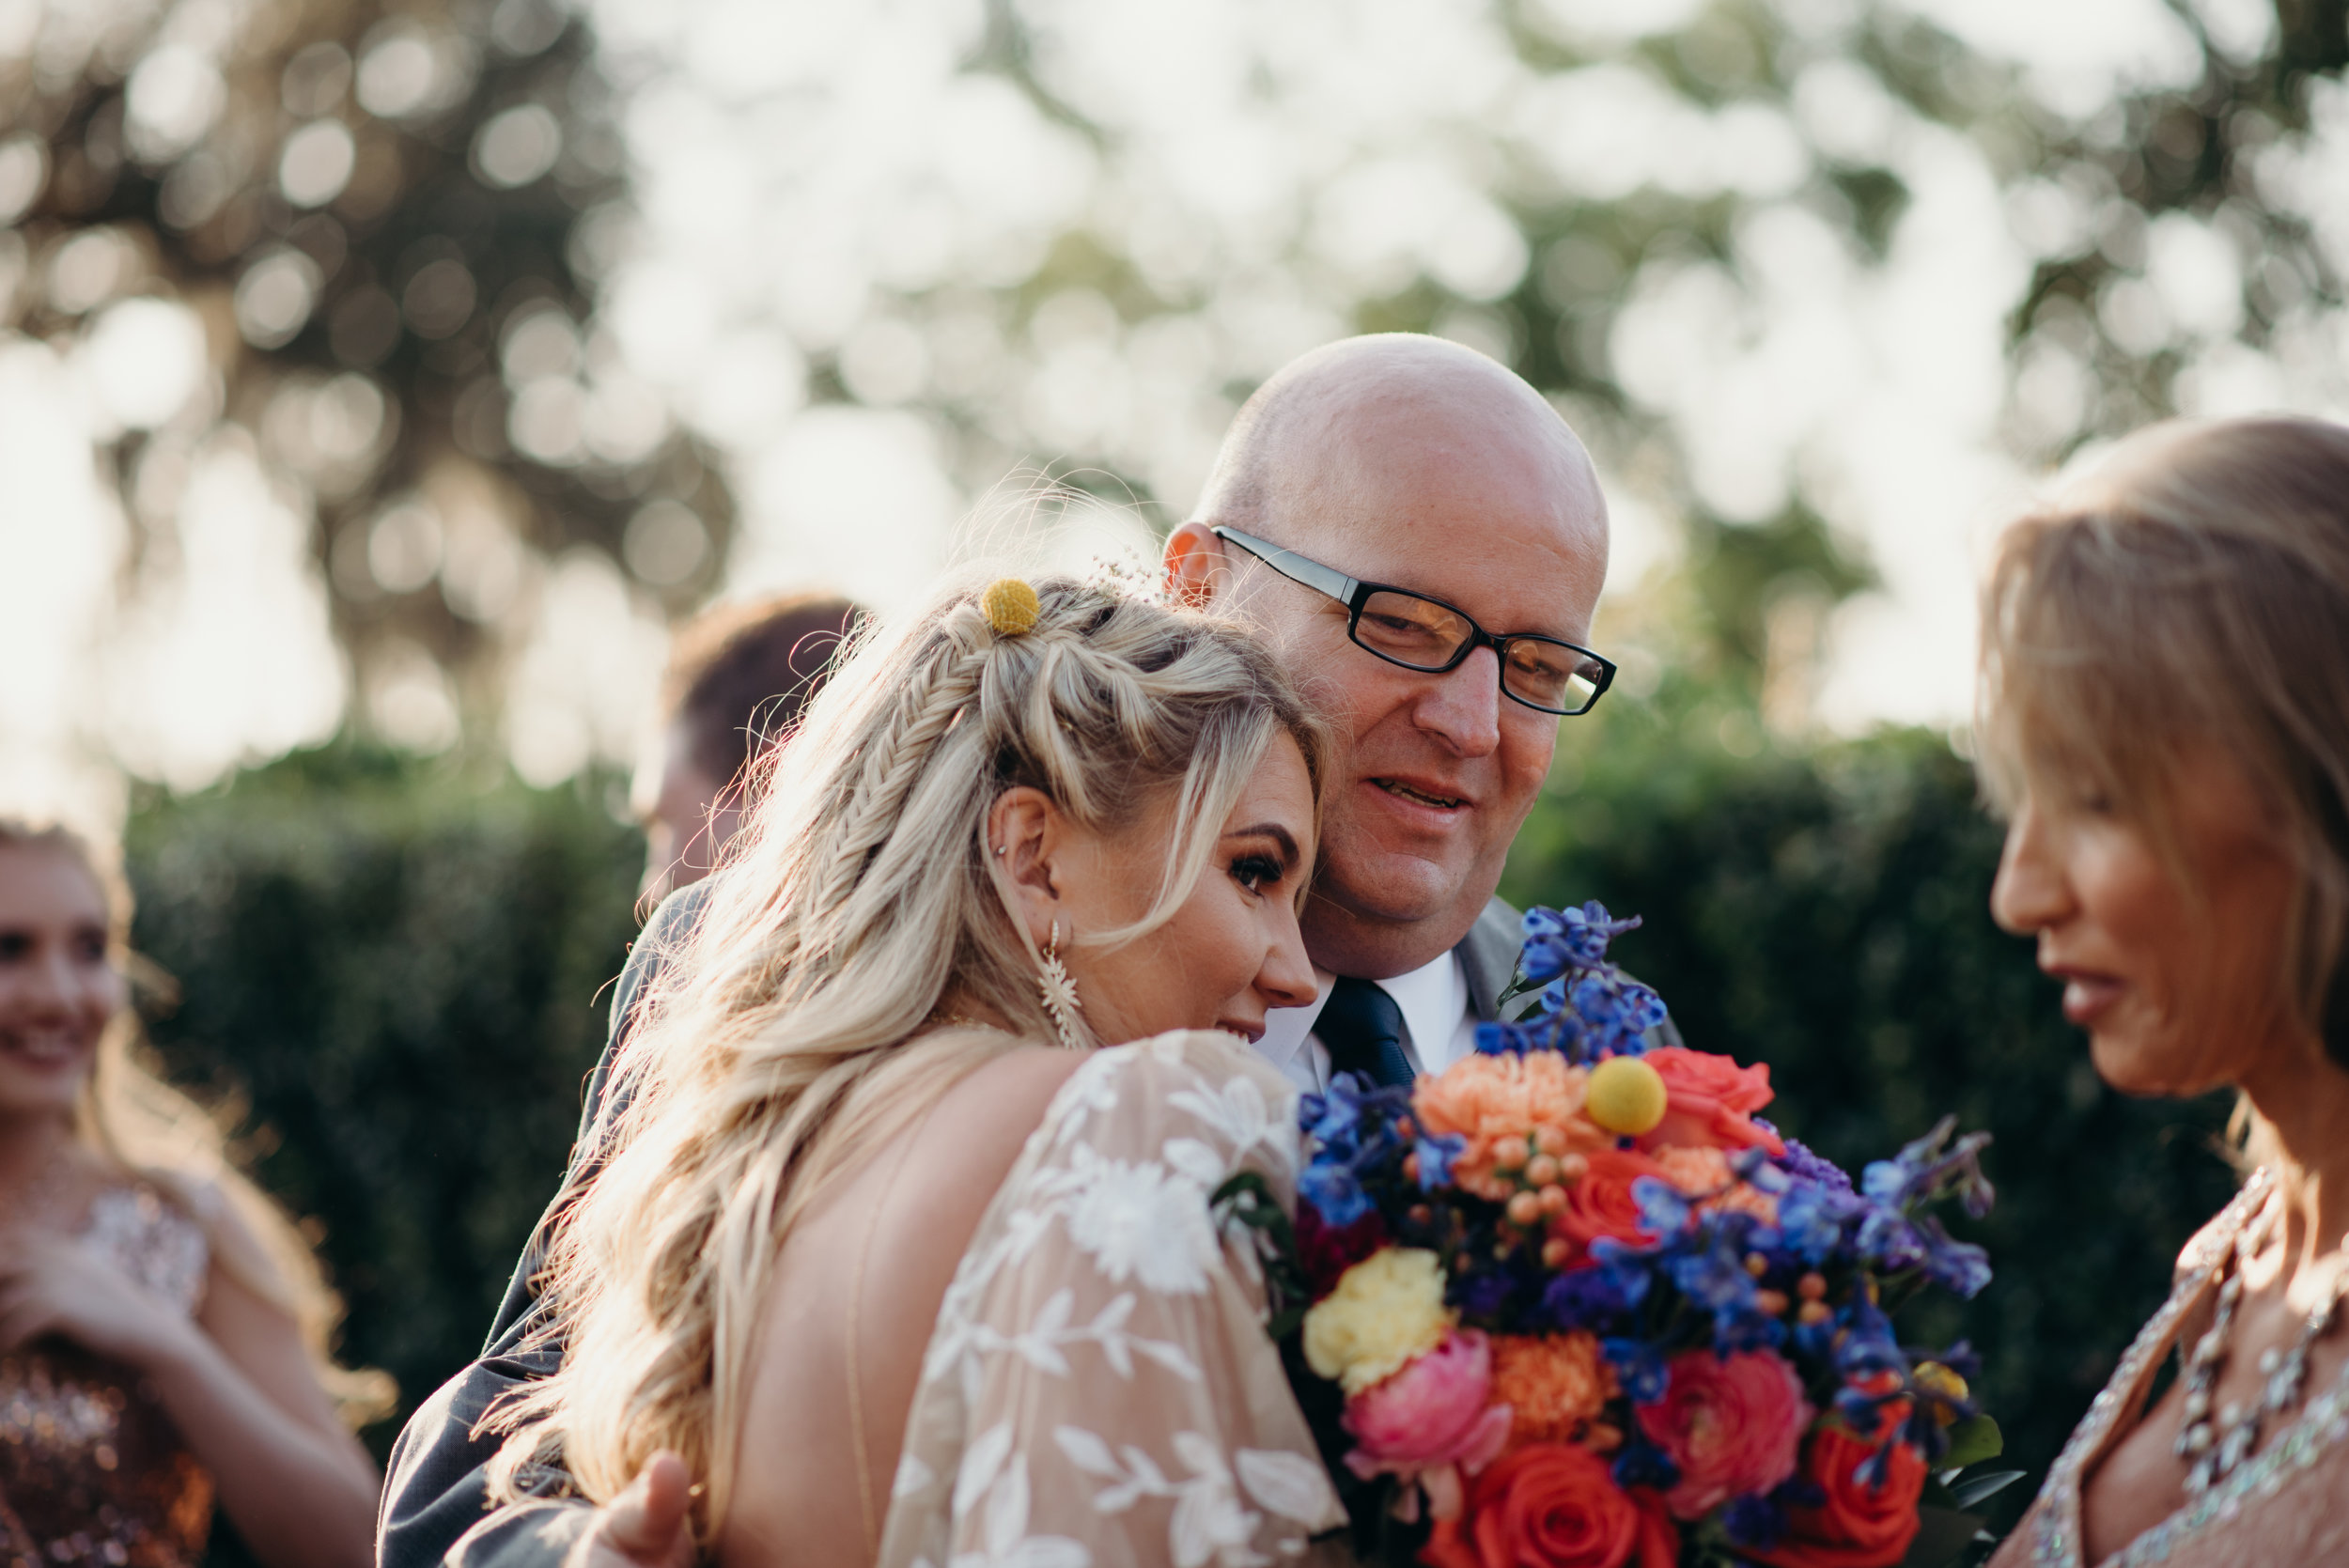 zayda-collin-panama-city-wedding-photography-trippy-bohemian-lisa-frank-wedding-ceremony-89.jpg